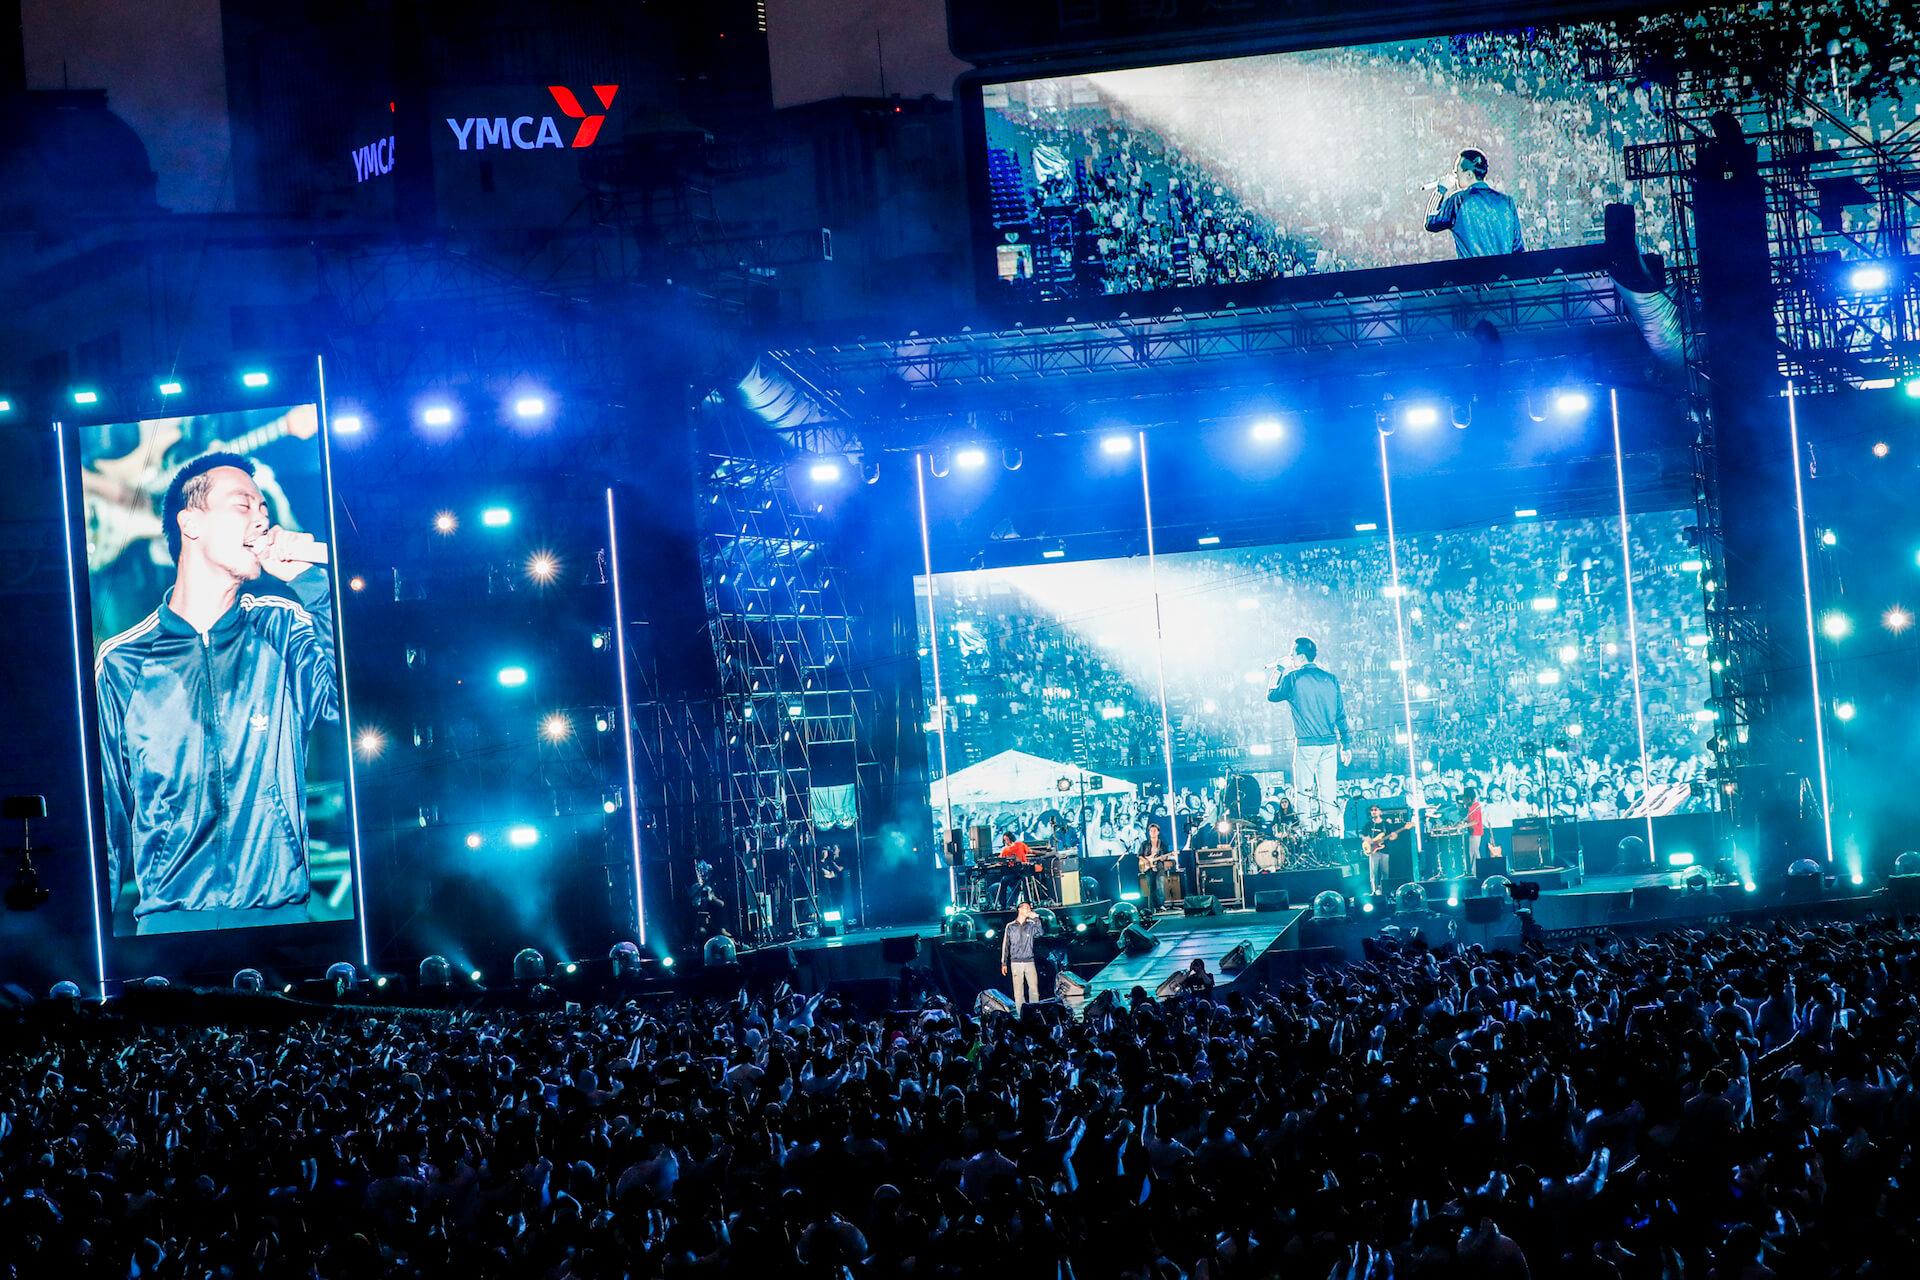 【Photo Documentary】Suchmos THE LIVE 横浜スタジアム e7701844f838e735b3e8bd480ec47091